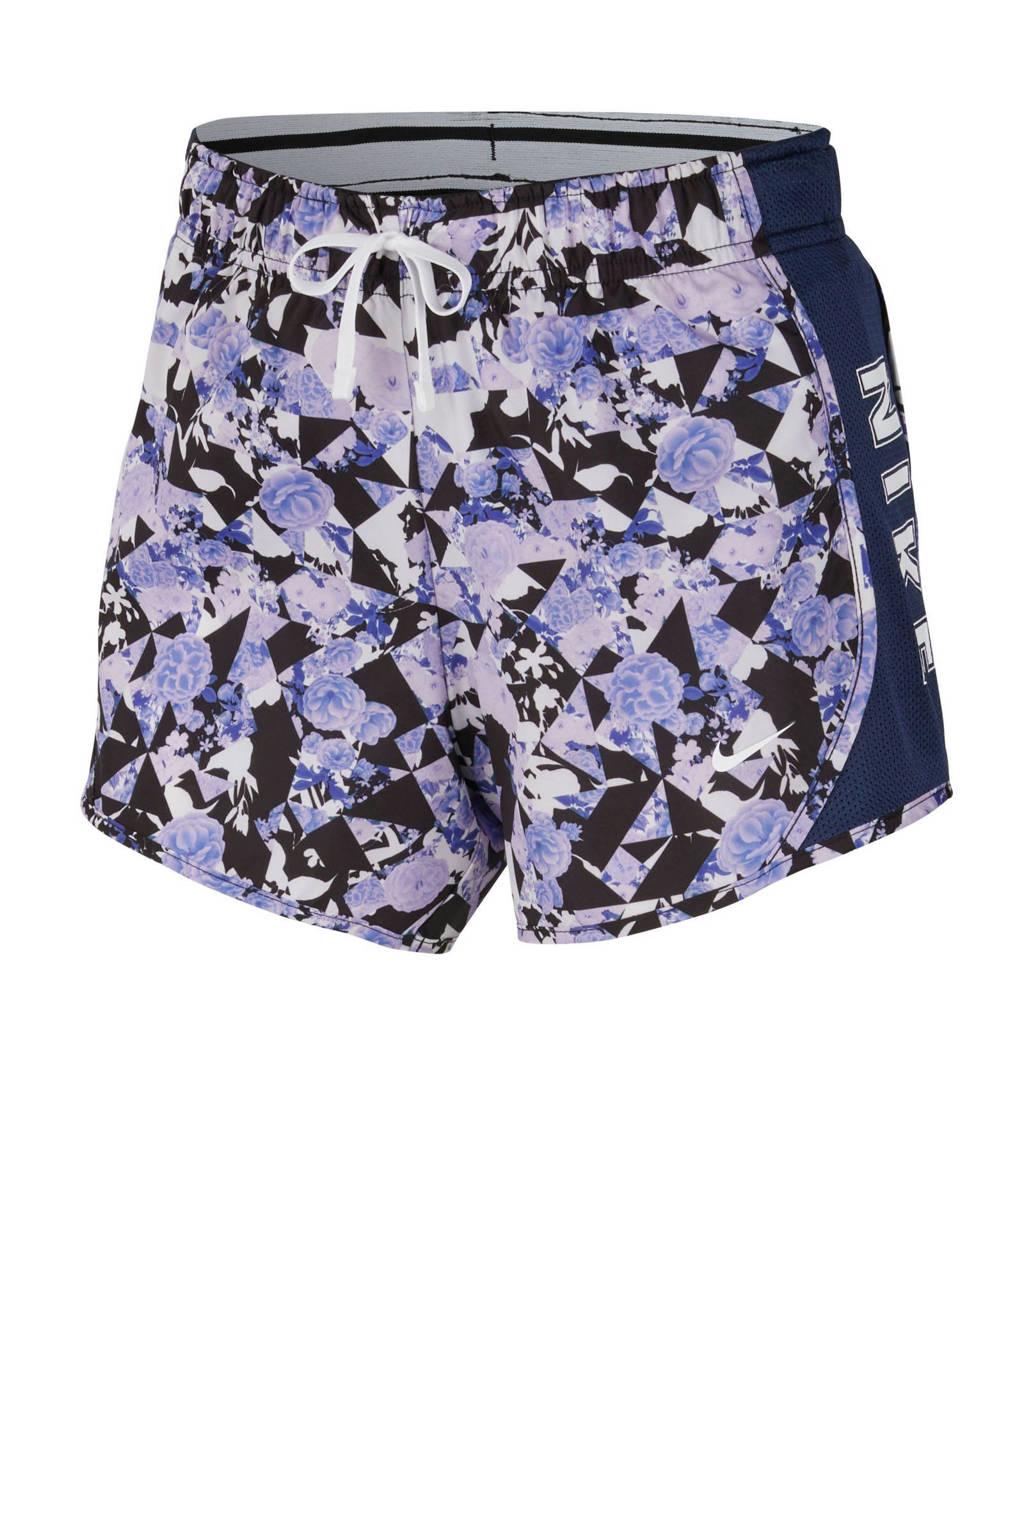 Nike sweatshort lila/donkerblauw, Lila/donkerblauw